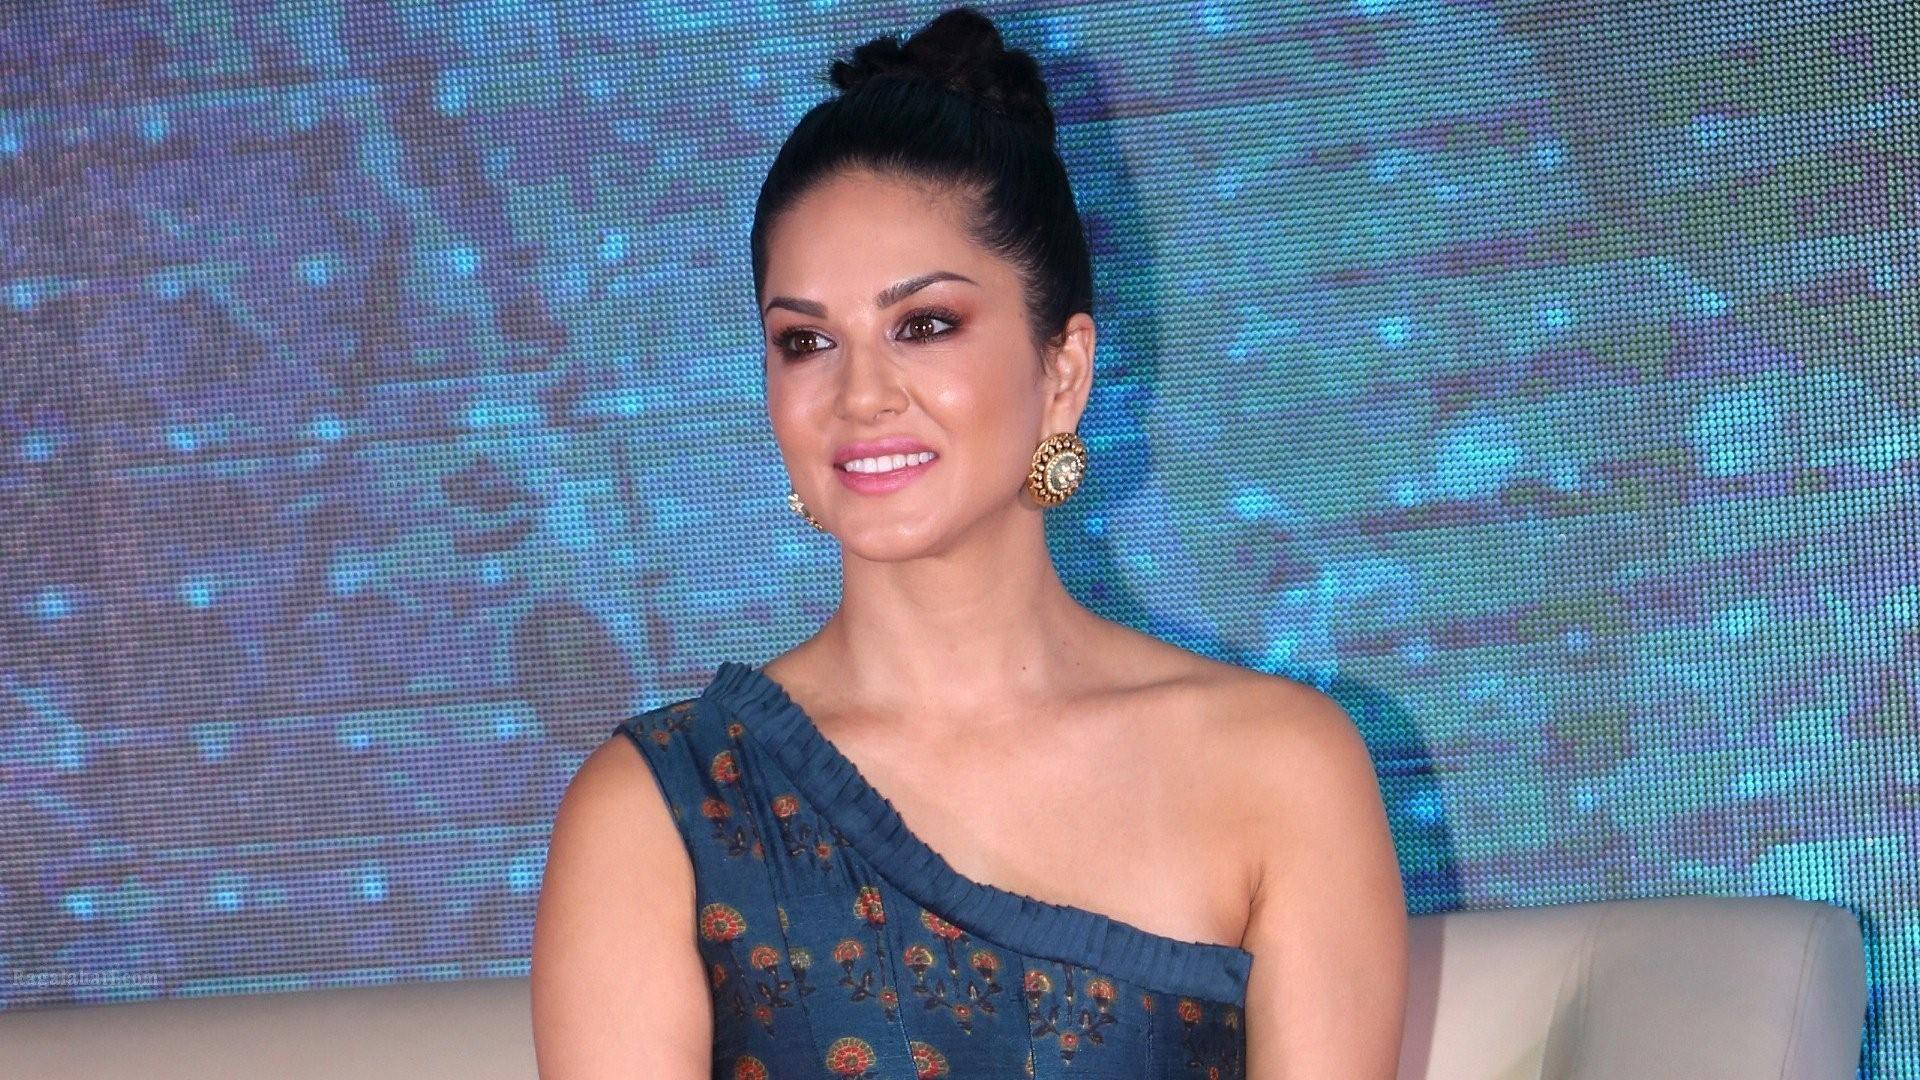 Bollywood Model Girl Sunny Leone Hd Wallpaper Hd Wallpapers